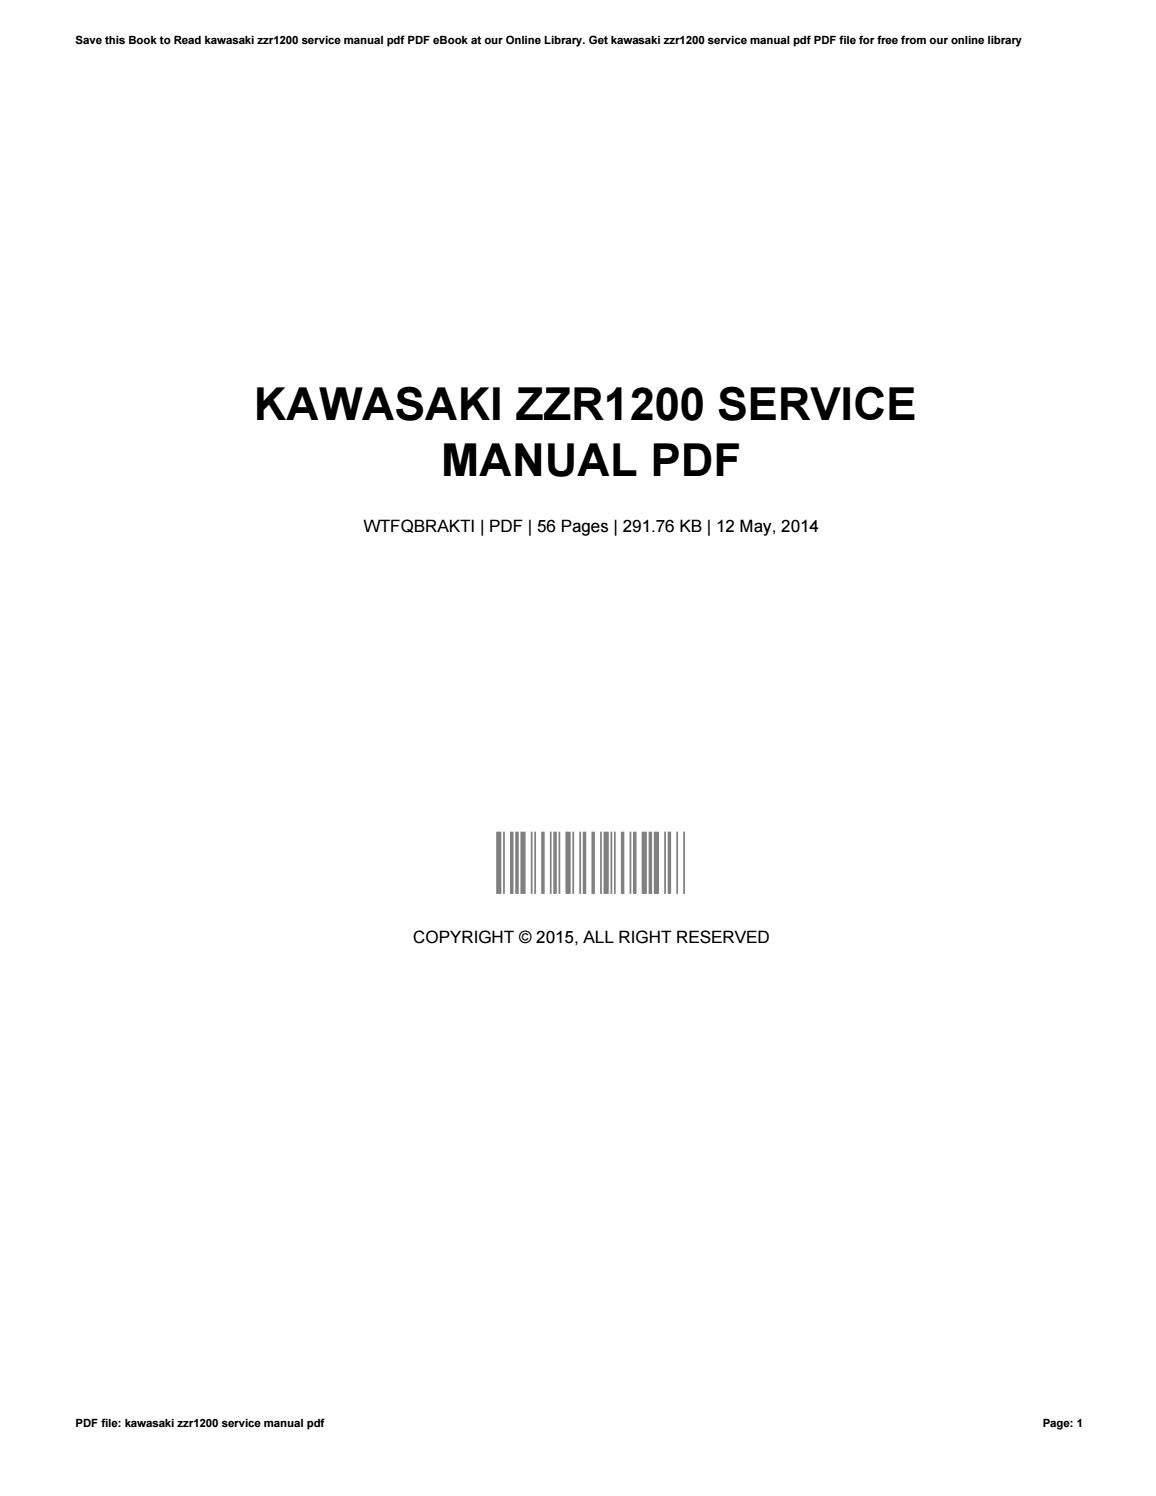 Kawasaki Zzr1200 Workshop Manual Zzr 1200 Wiring Diagram Service Pdf By Davidcraft4062 Issuu Rh Com 1100 Download